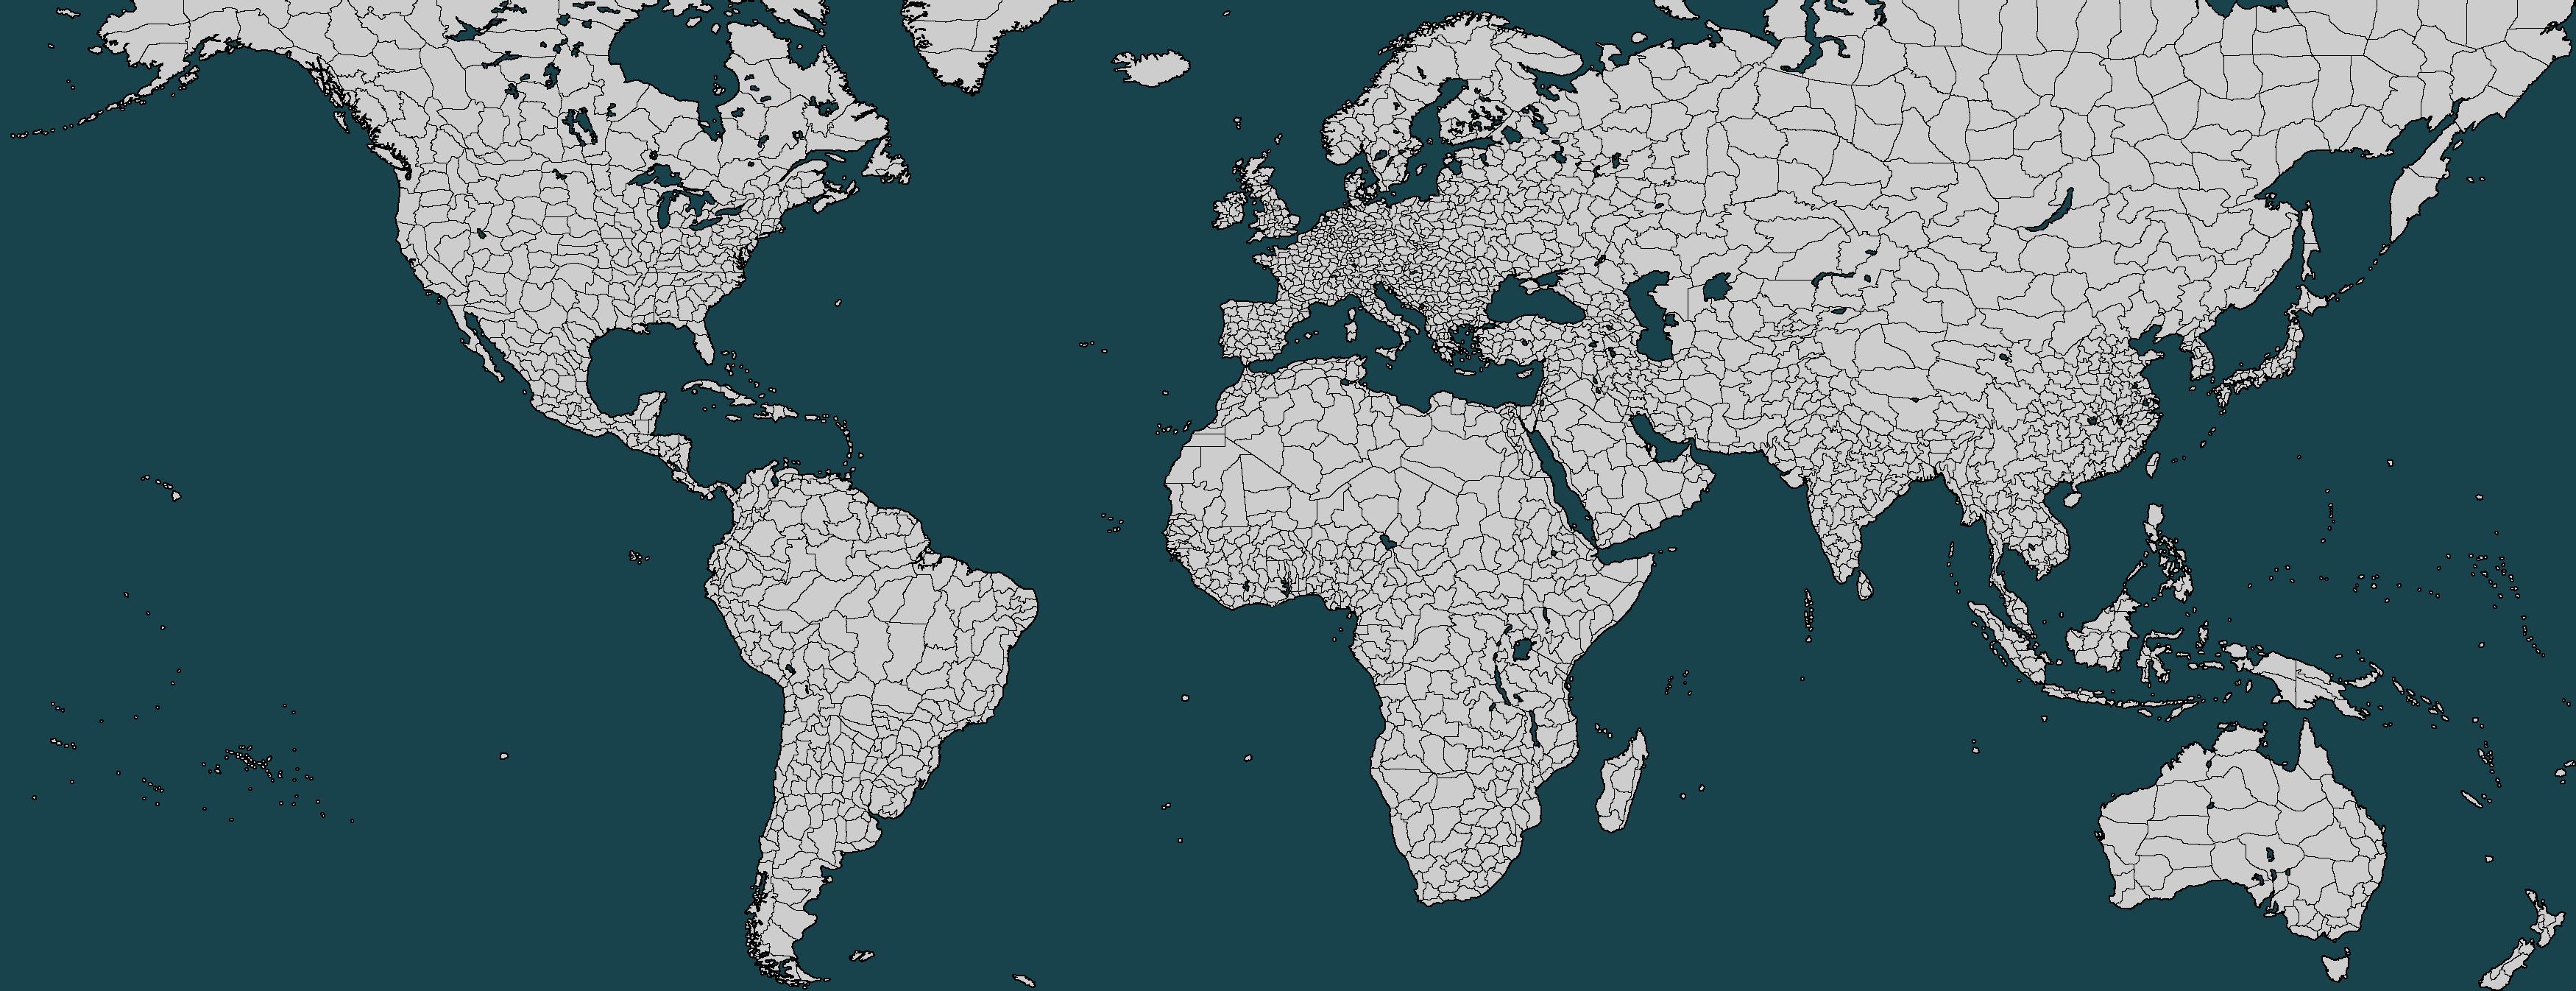 Файл:Vic2-map-3500-div-blank.png